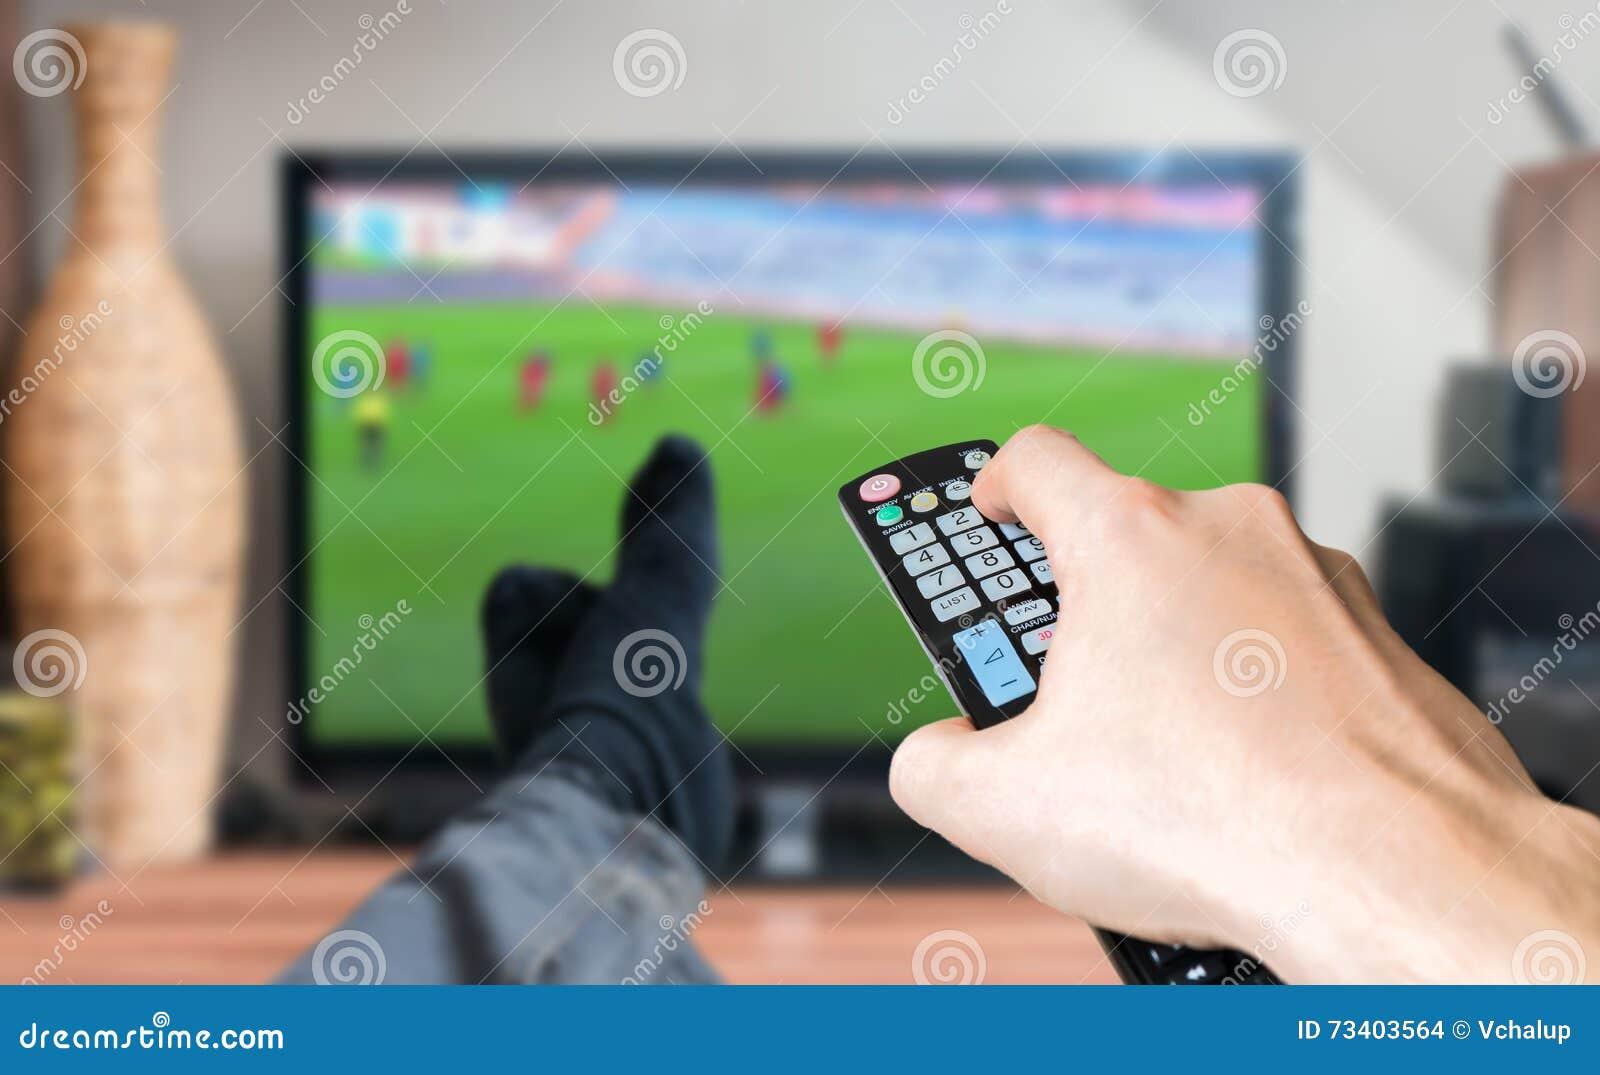 Men football and tv essay